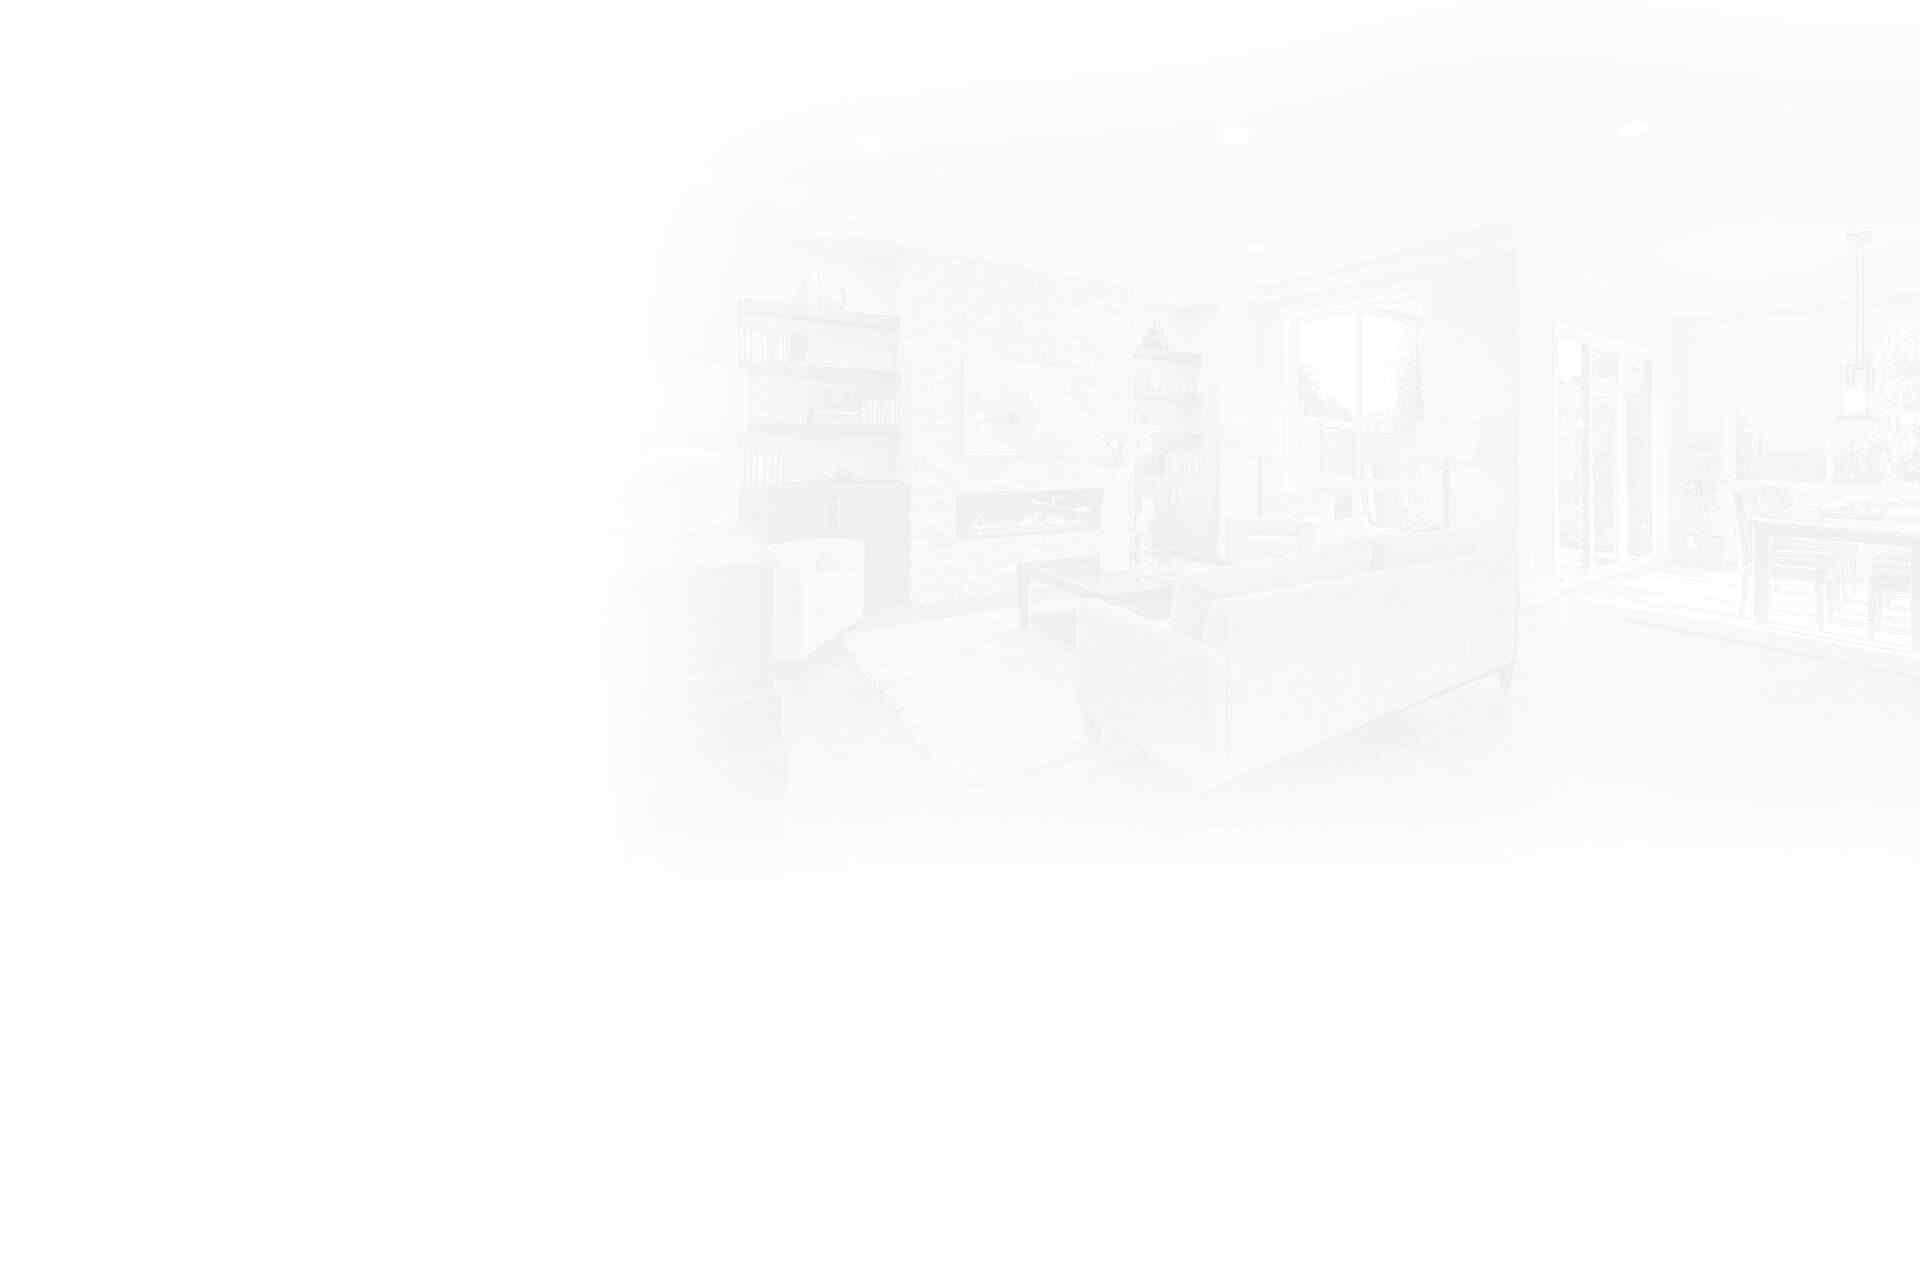 https://secureservercdn.net/198.71.233.167/2kc.c64.myftpupload.com/wp-content/uploads/2018/10/background_grayscale_03.jpg?time=1629229629